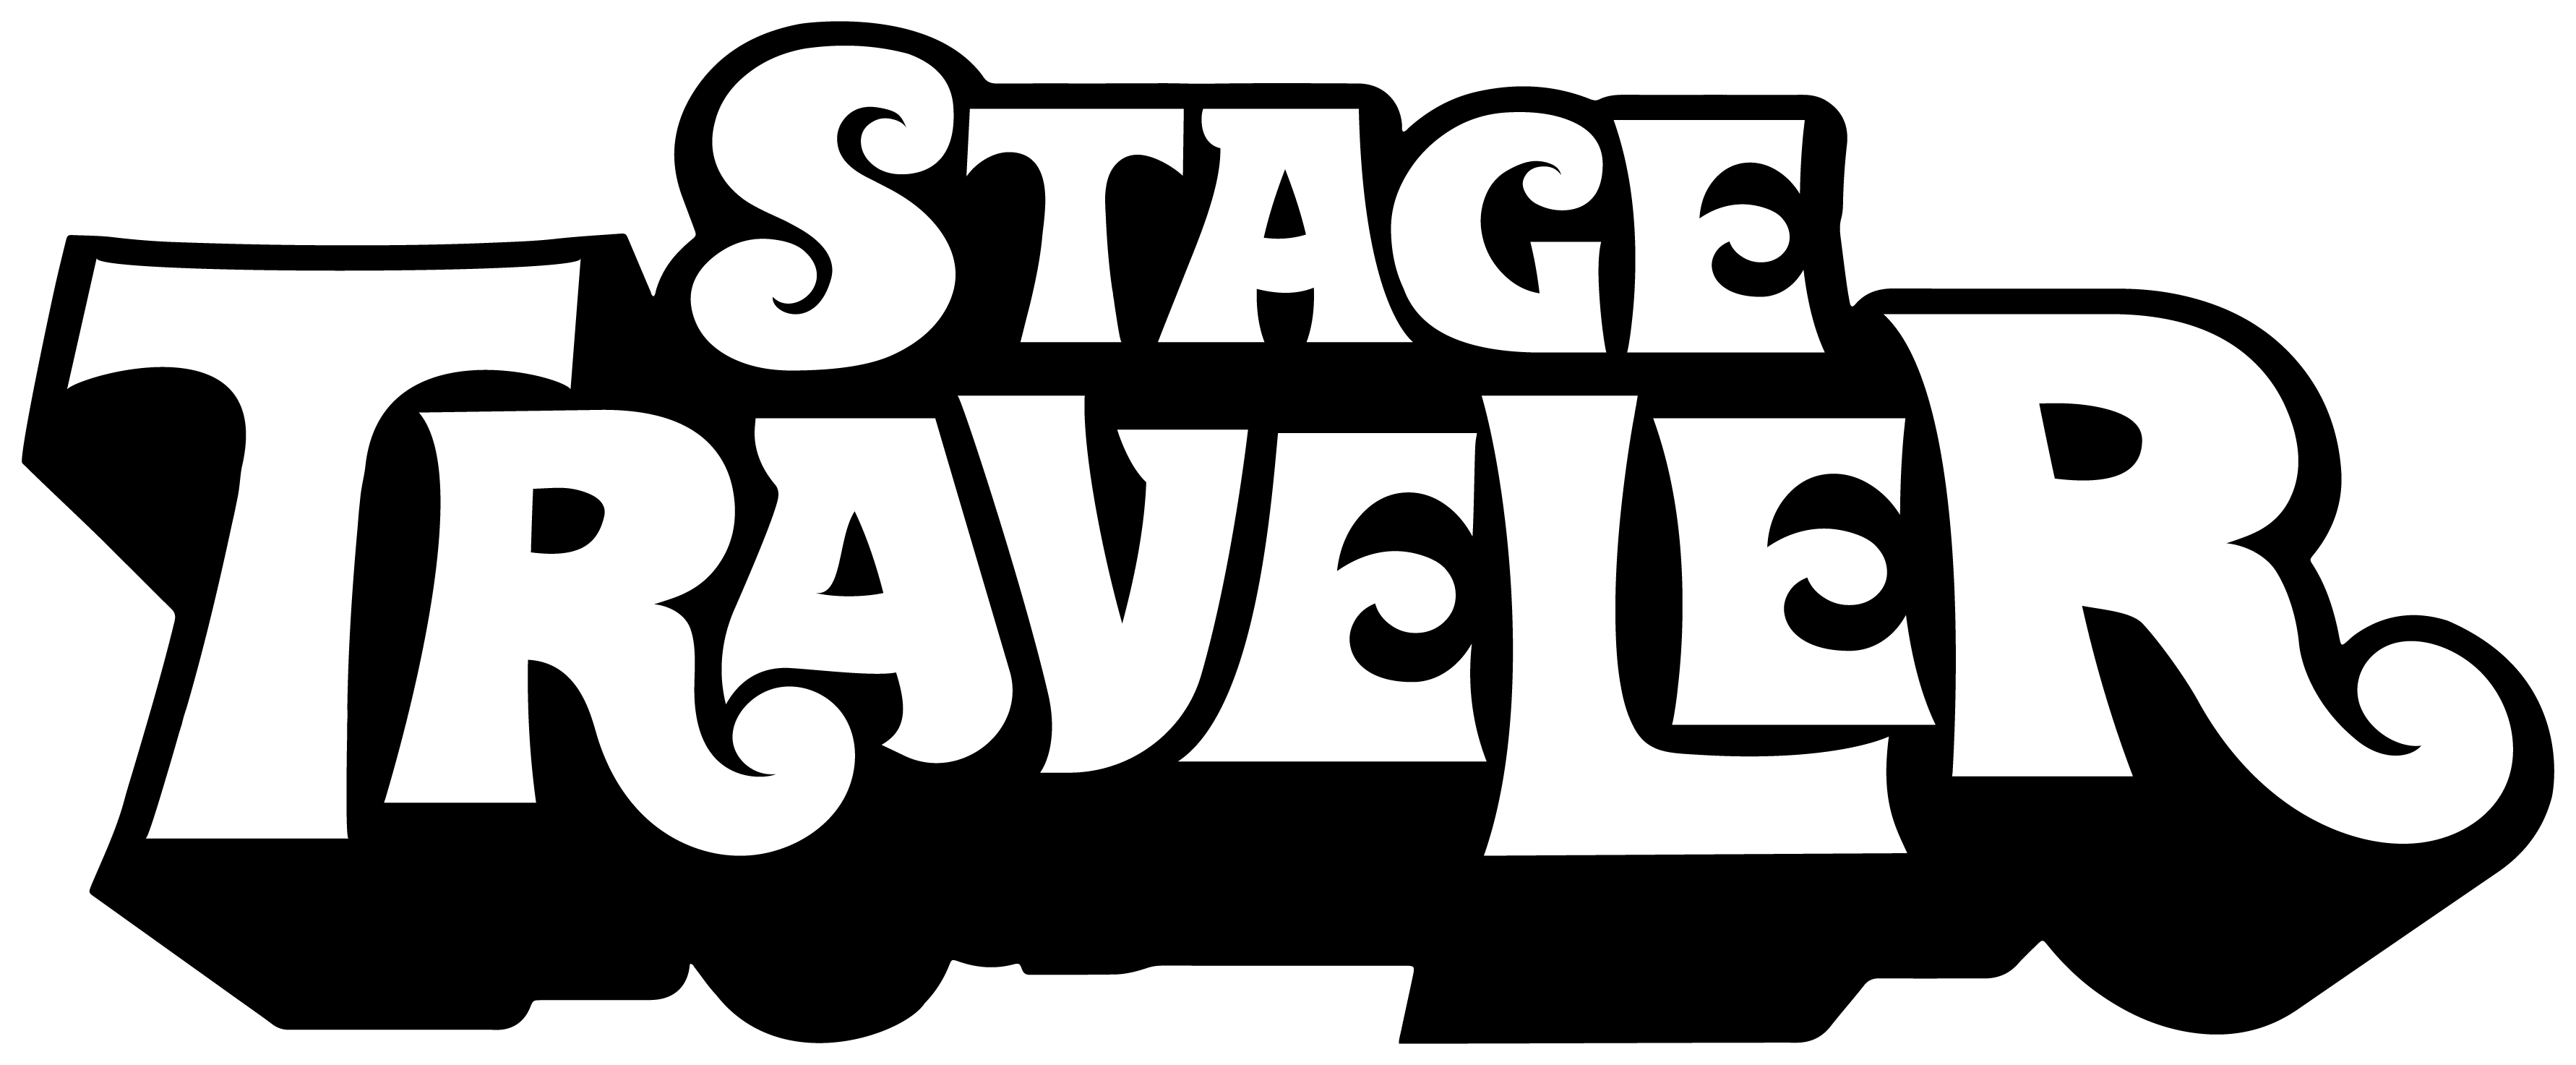 Design fun & memorable LOGO for a travel & music show.. StageTraveler